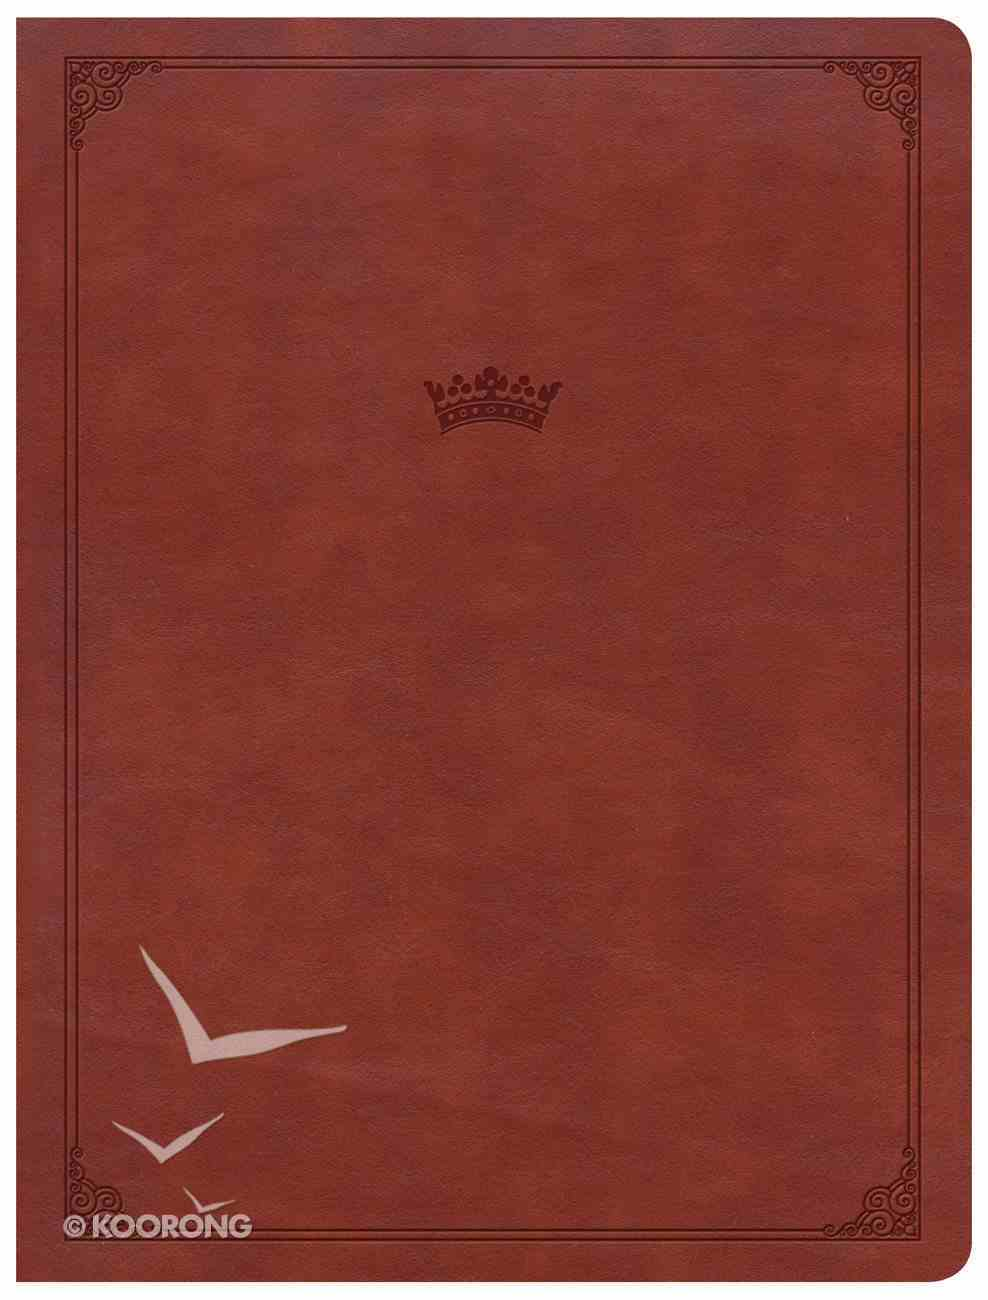 CSB Tony Evans Study Bible British Tan Indexed (Black Letter Edition) Imitation Leather